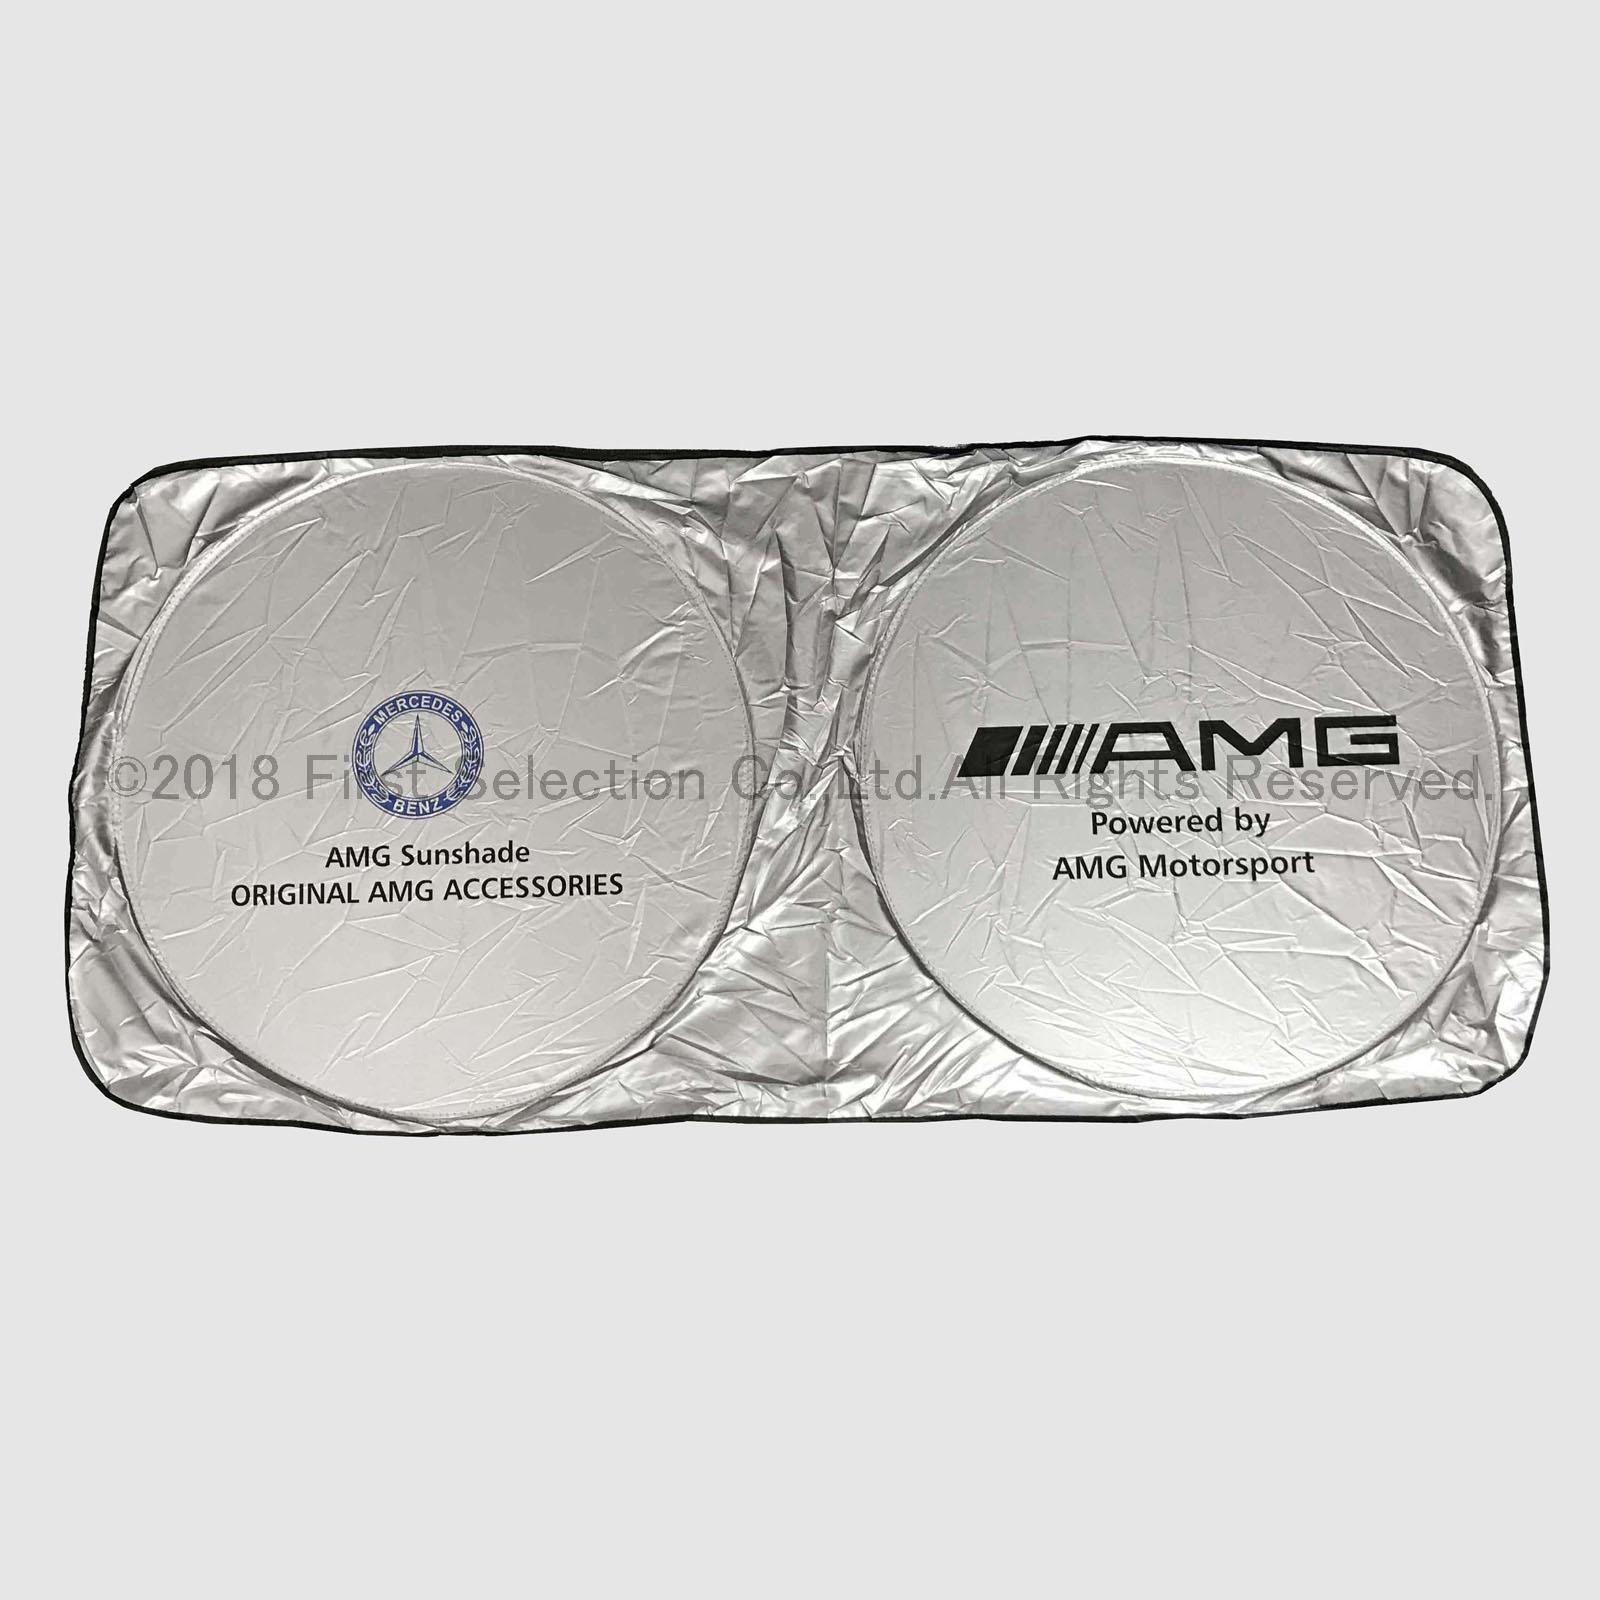 Mercedes-Benz ベンツ車 AMGロゴ 汎用サンシェード Lサイズ タイベック製